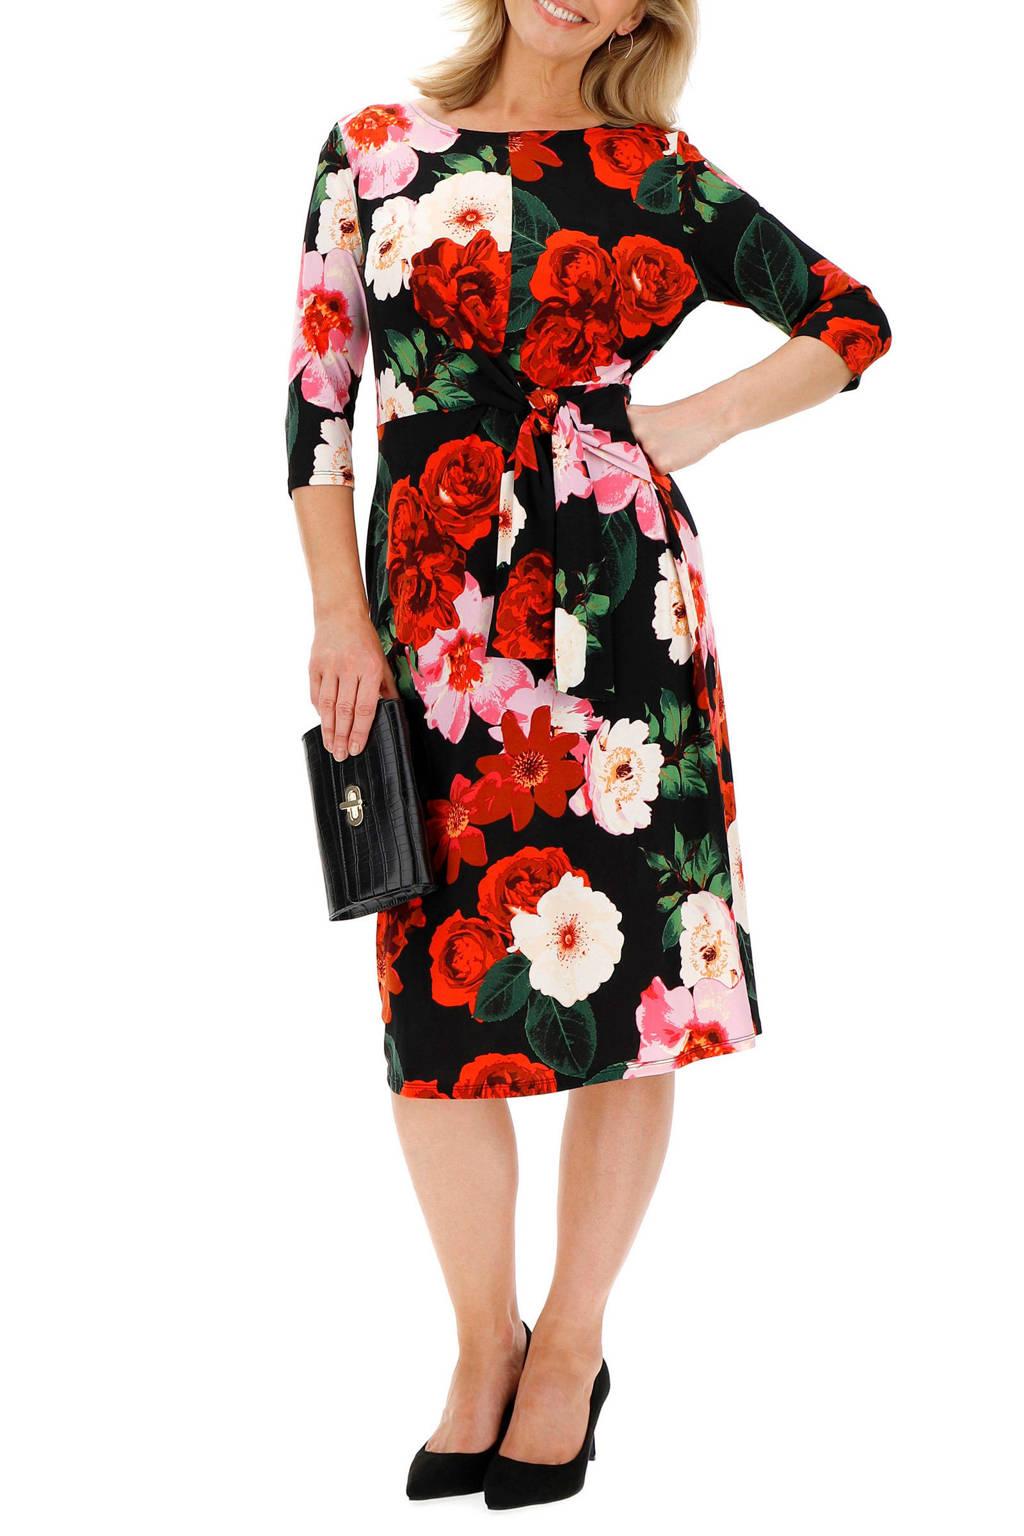 JD Williams gebloemde jurk zwart/rood/roze, Zwart/rood/roze